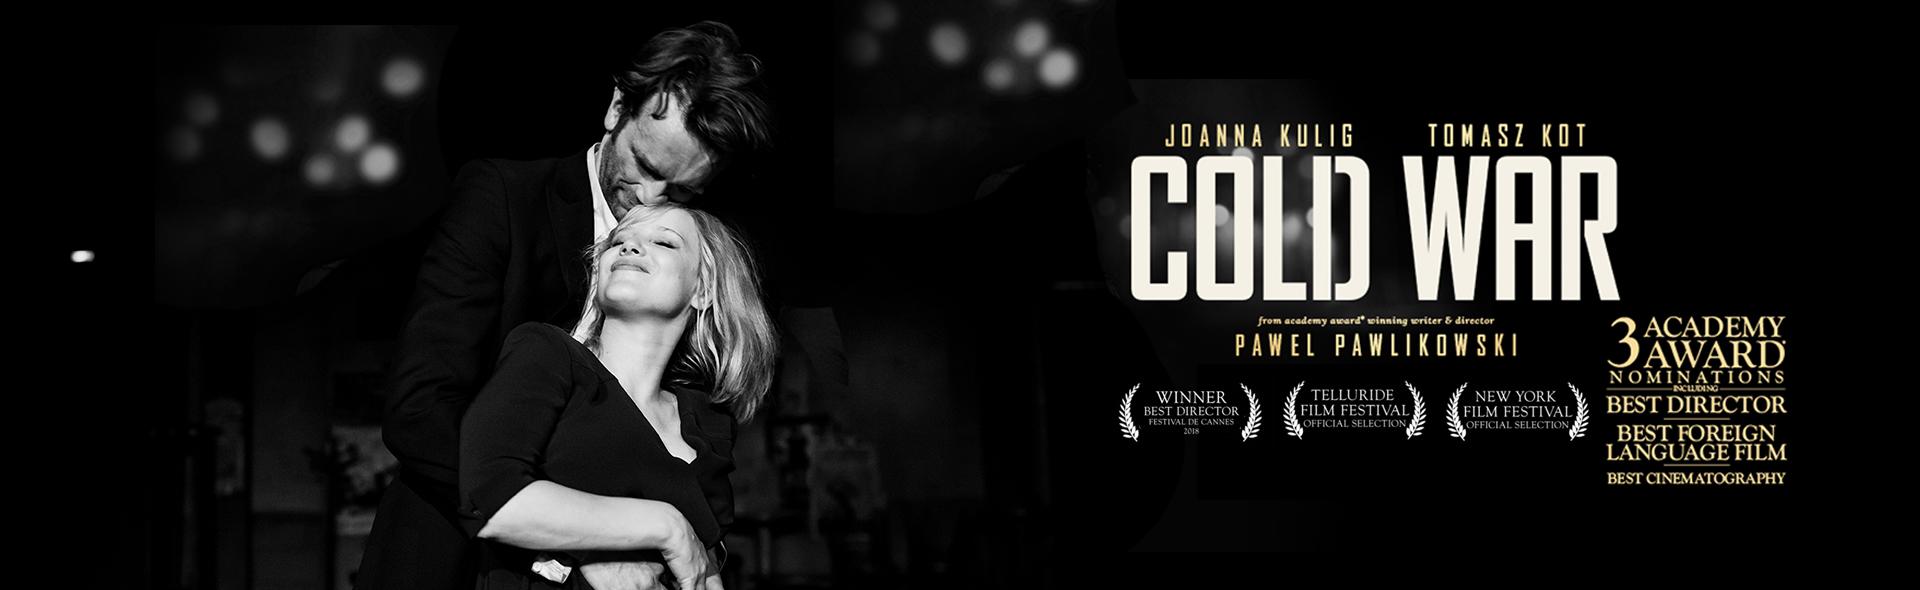 Cinestaan Film Company